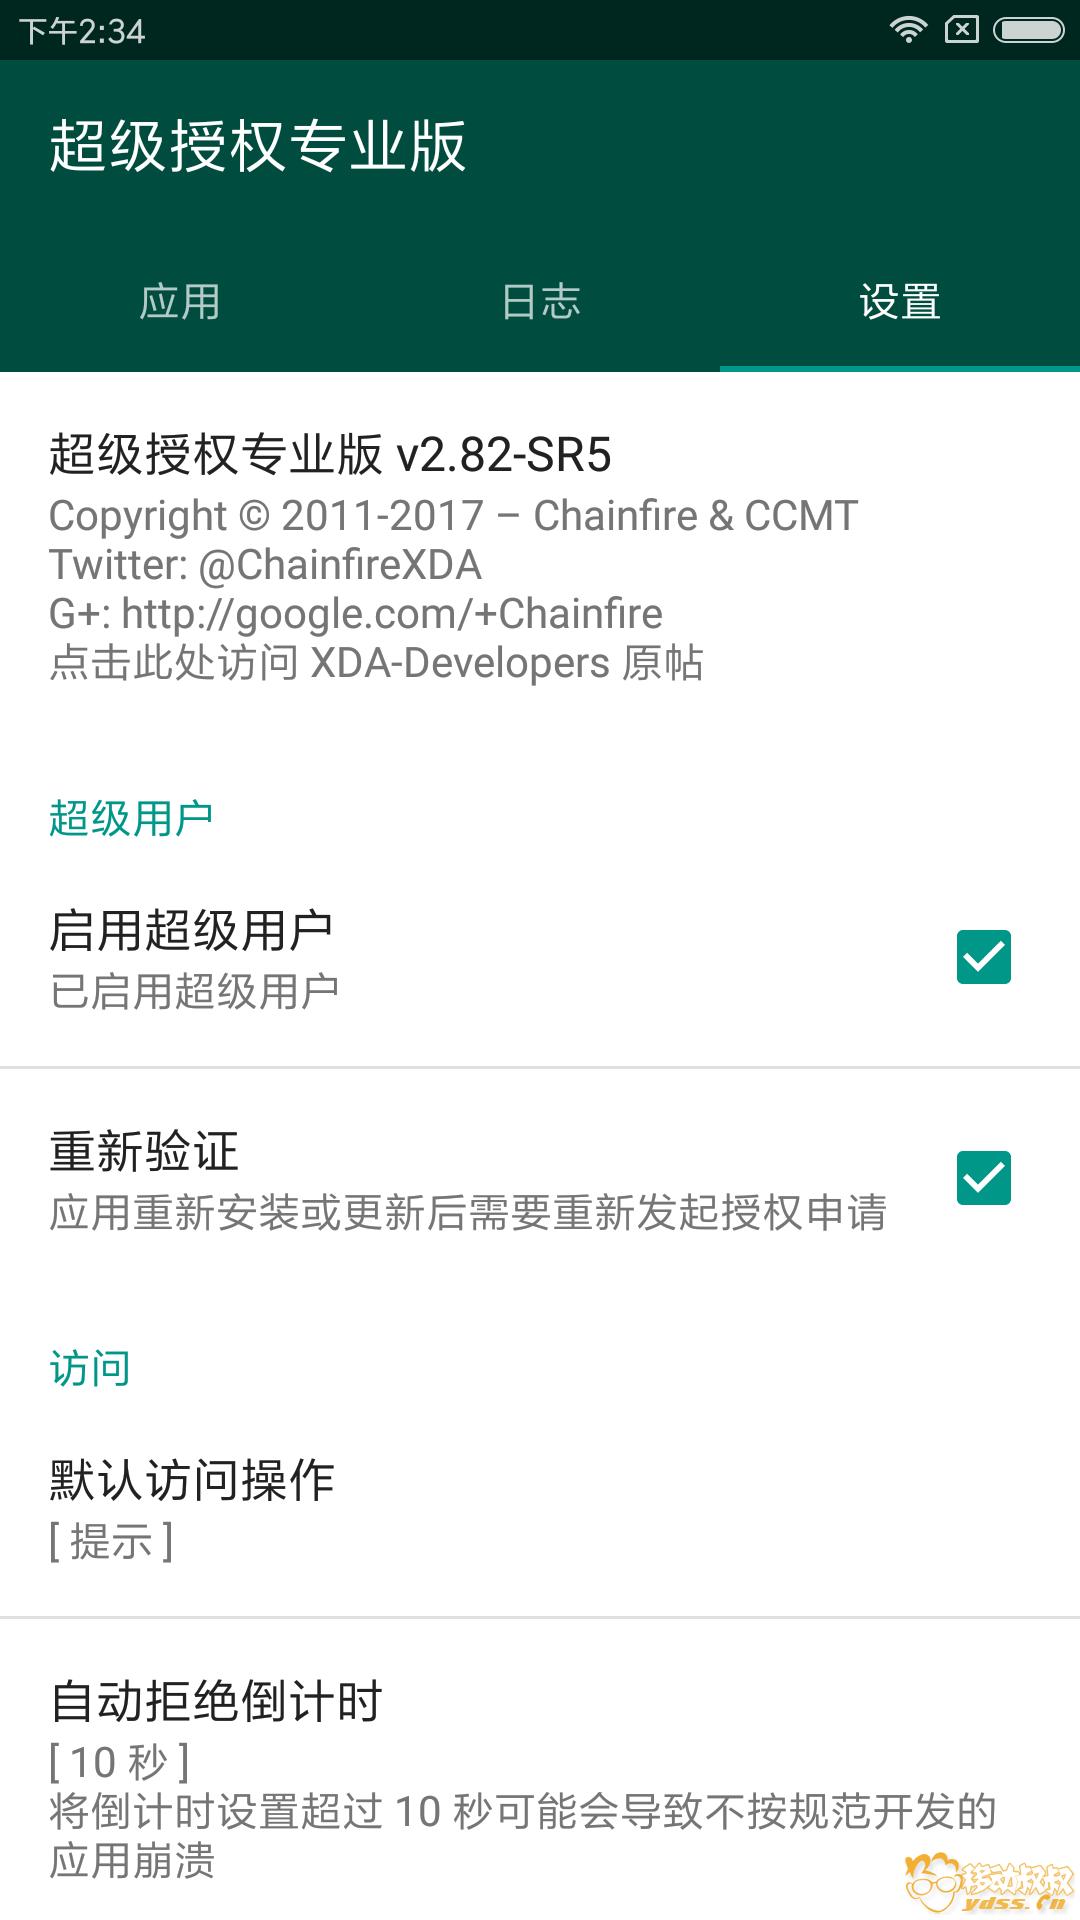 Screenshot_2017-11-07-14-34-18-594_eu.chainfire.supersu.png